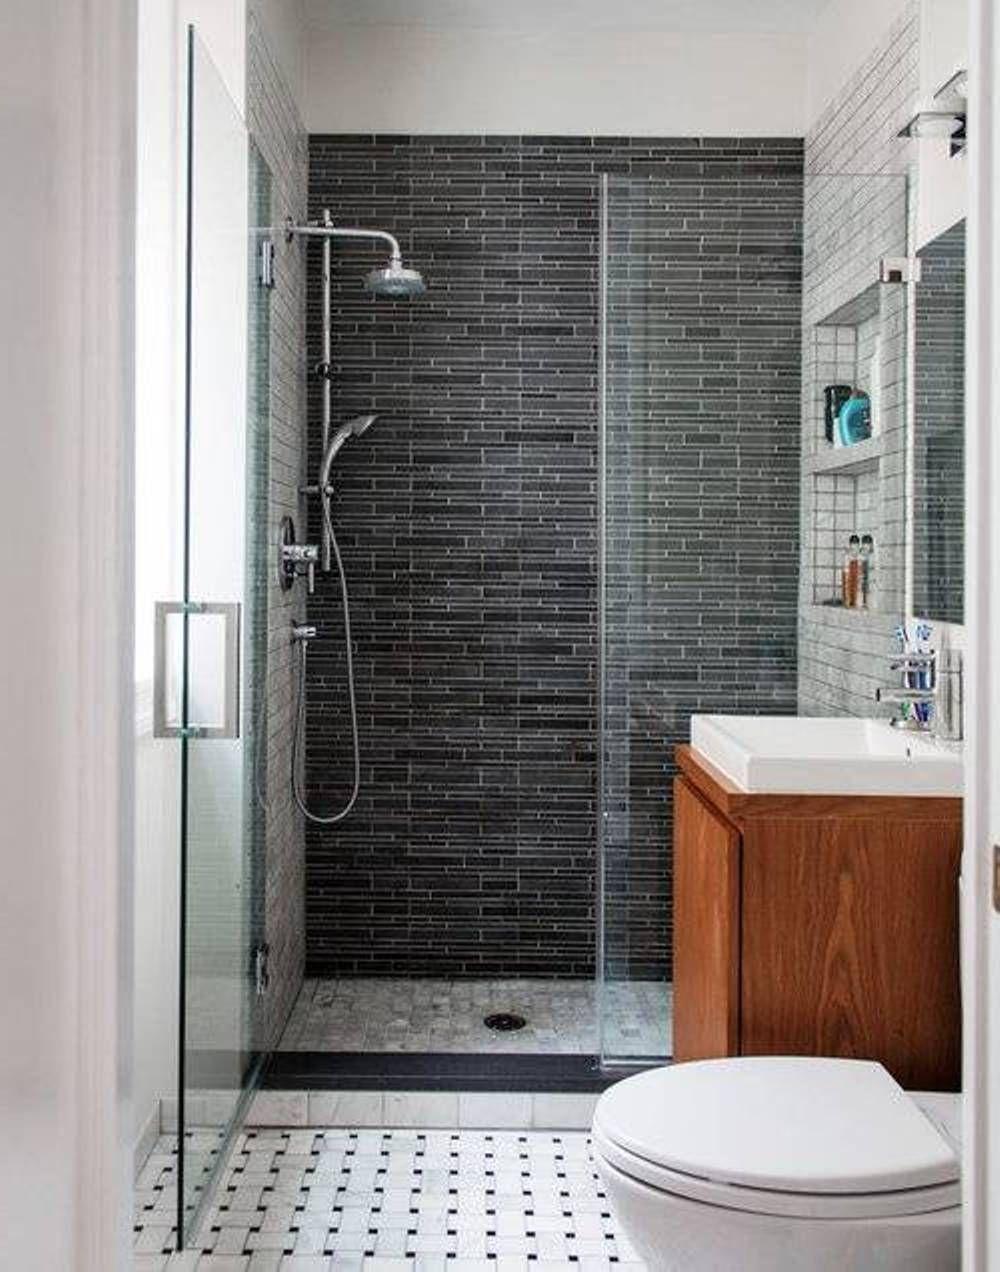 Pin By Sherri Bock On Home Small Bathroom Remodel Cheap Bathroom Remodel Simple Small Bathroom Designs